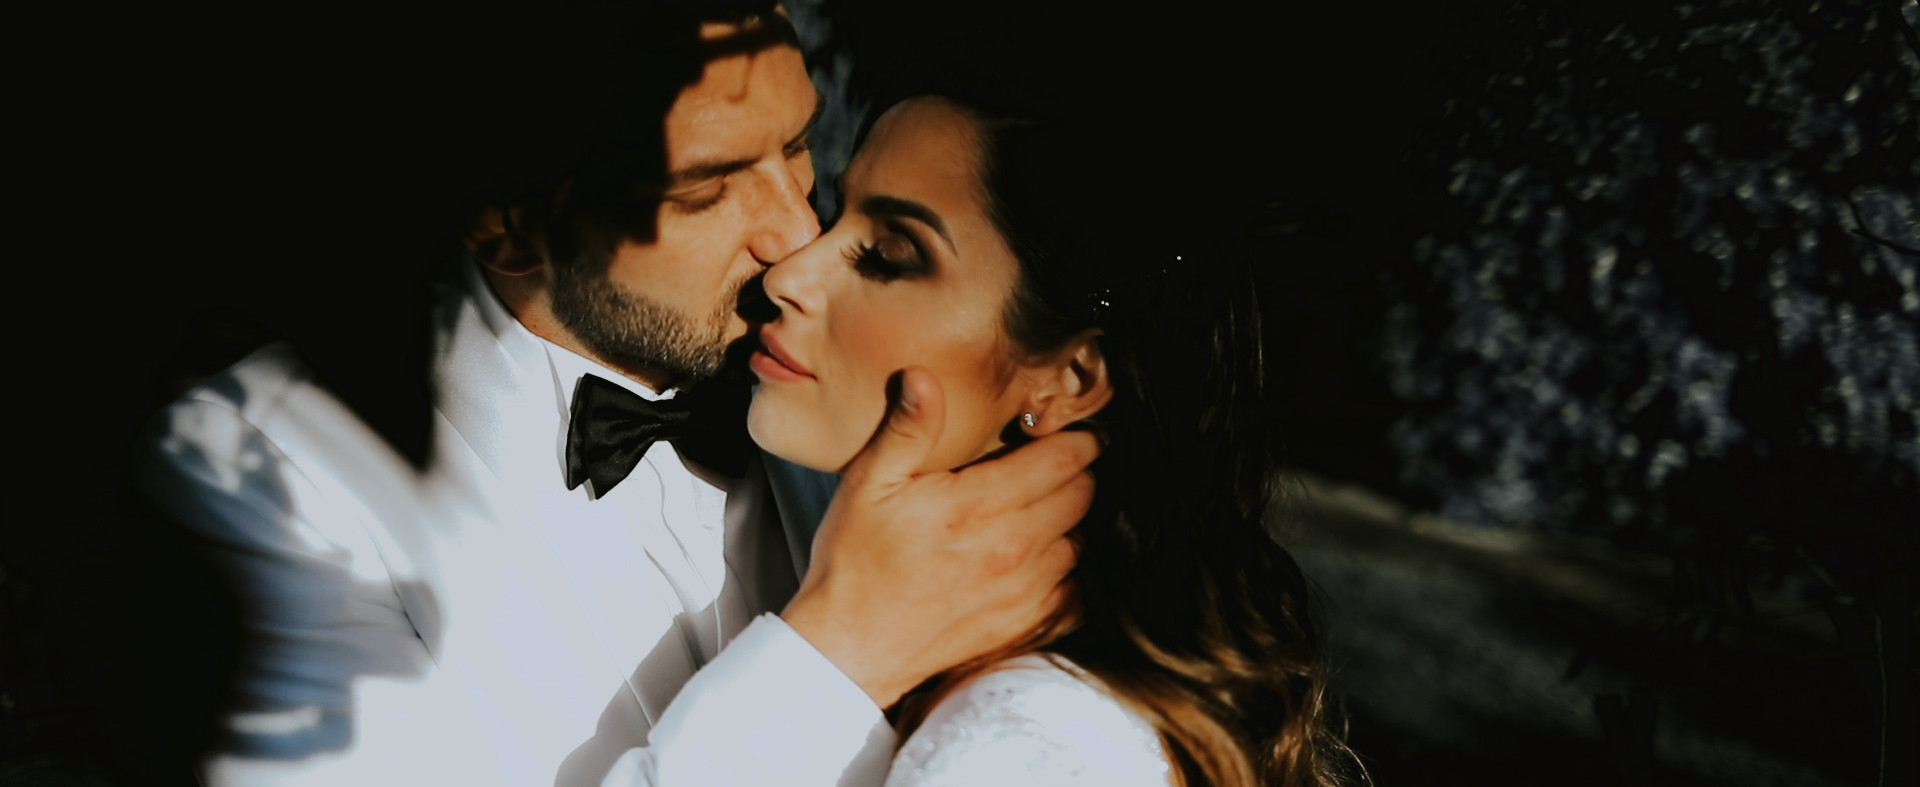 federico-cardone-alessia-macari-video-matrimonio-videografo-4 Matrimonio Alessia Macari & Oliver Kragl